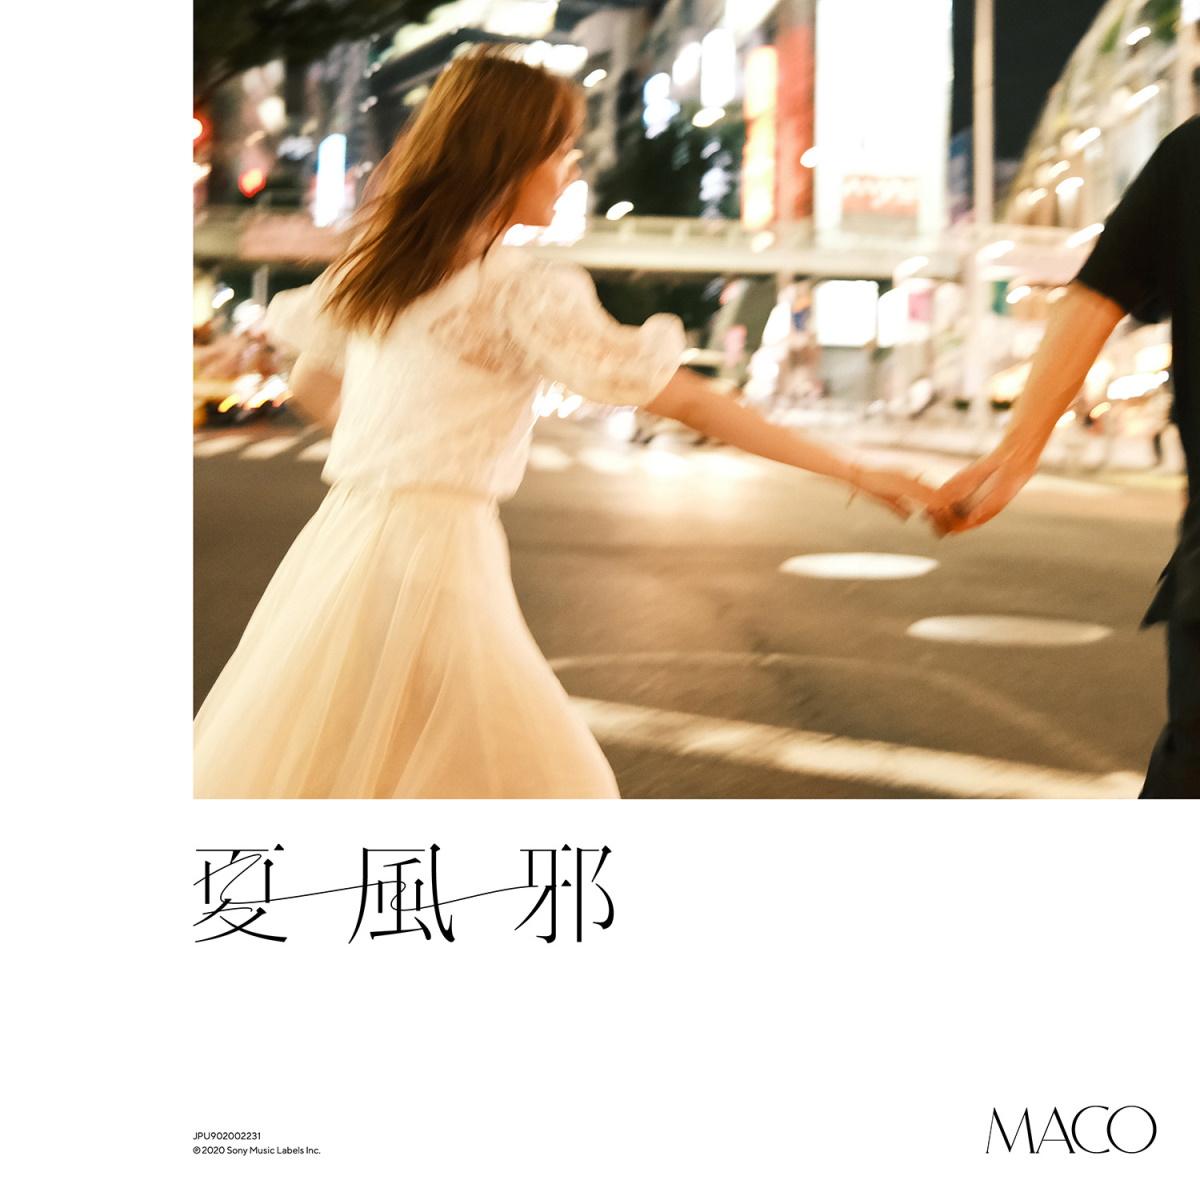 『MACO - 夏風邪』収録の『夏風邪』ジャケット